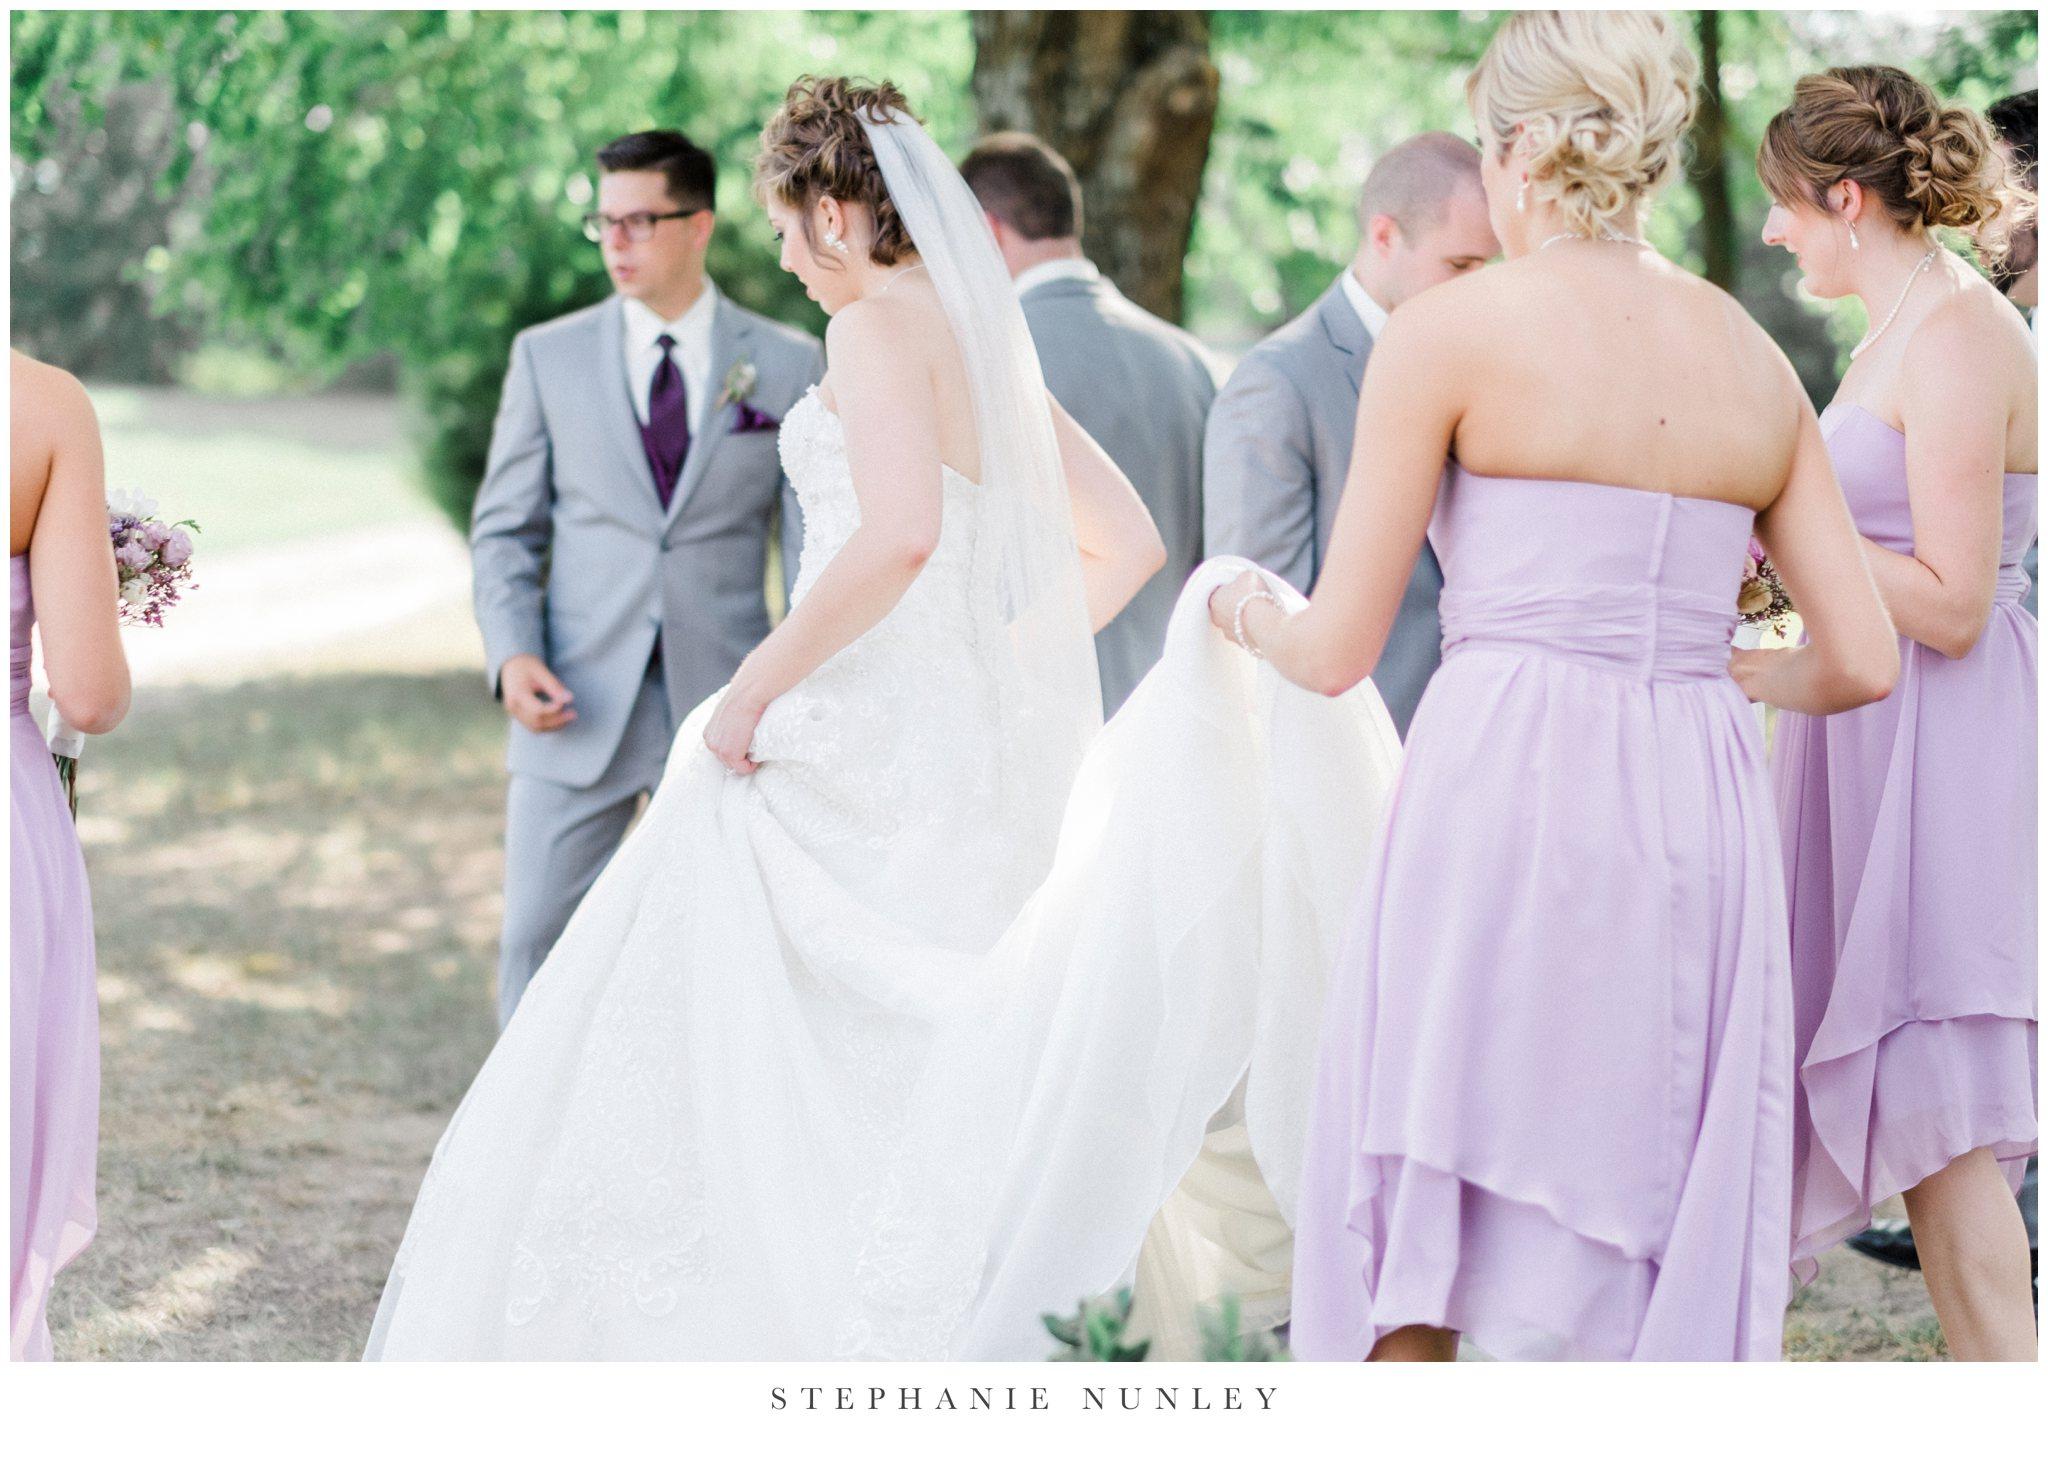 southern-classy-outdoor-barn-wedding-photos-0063.jpg